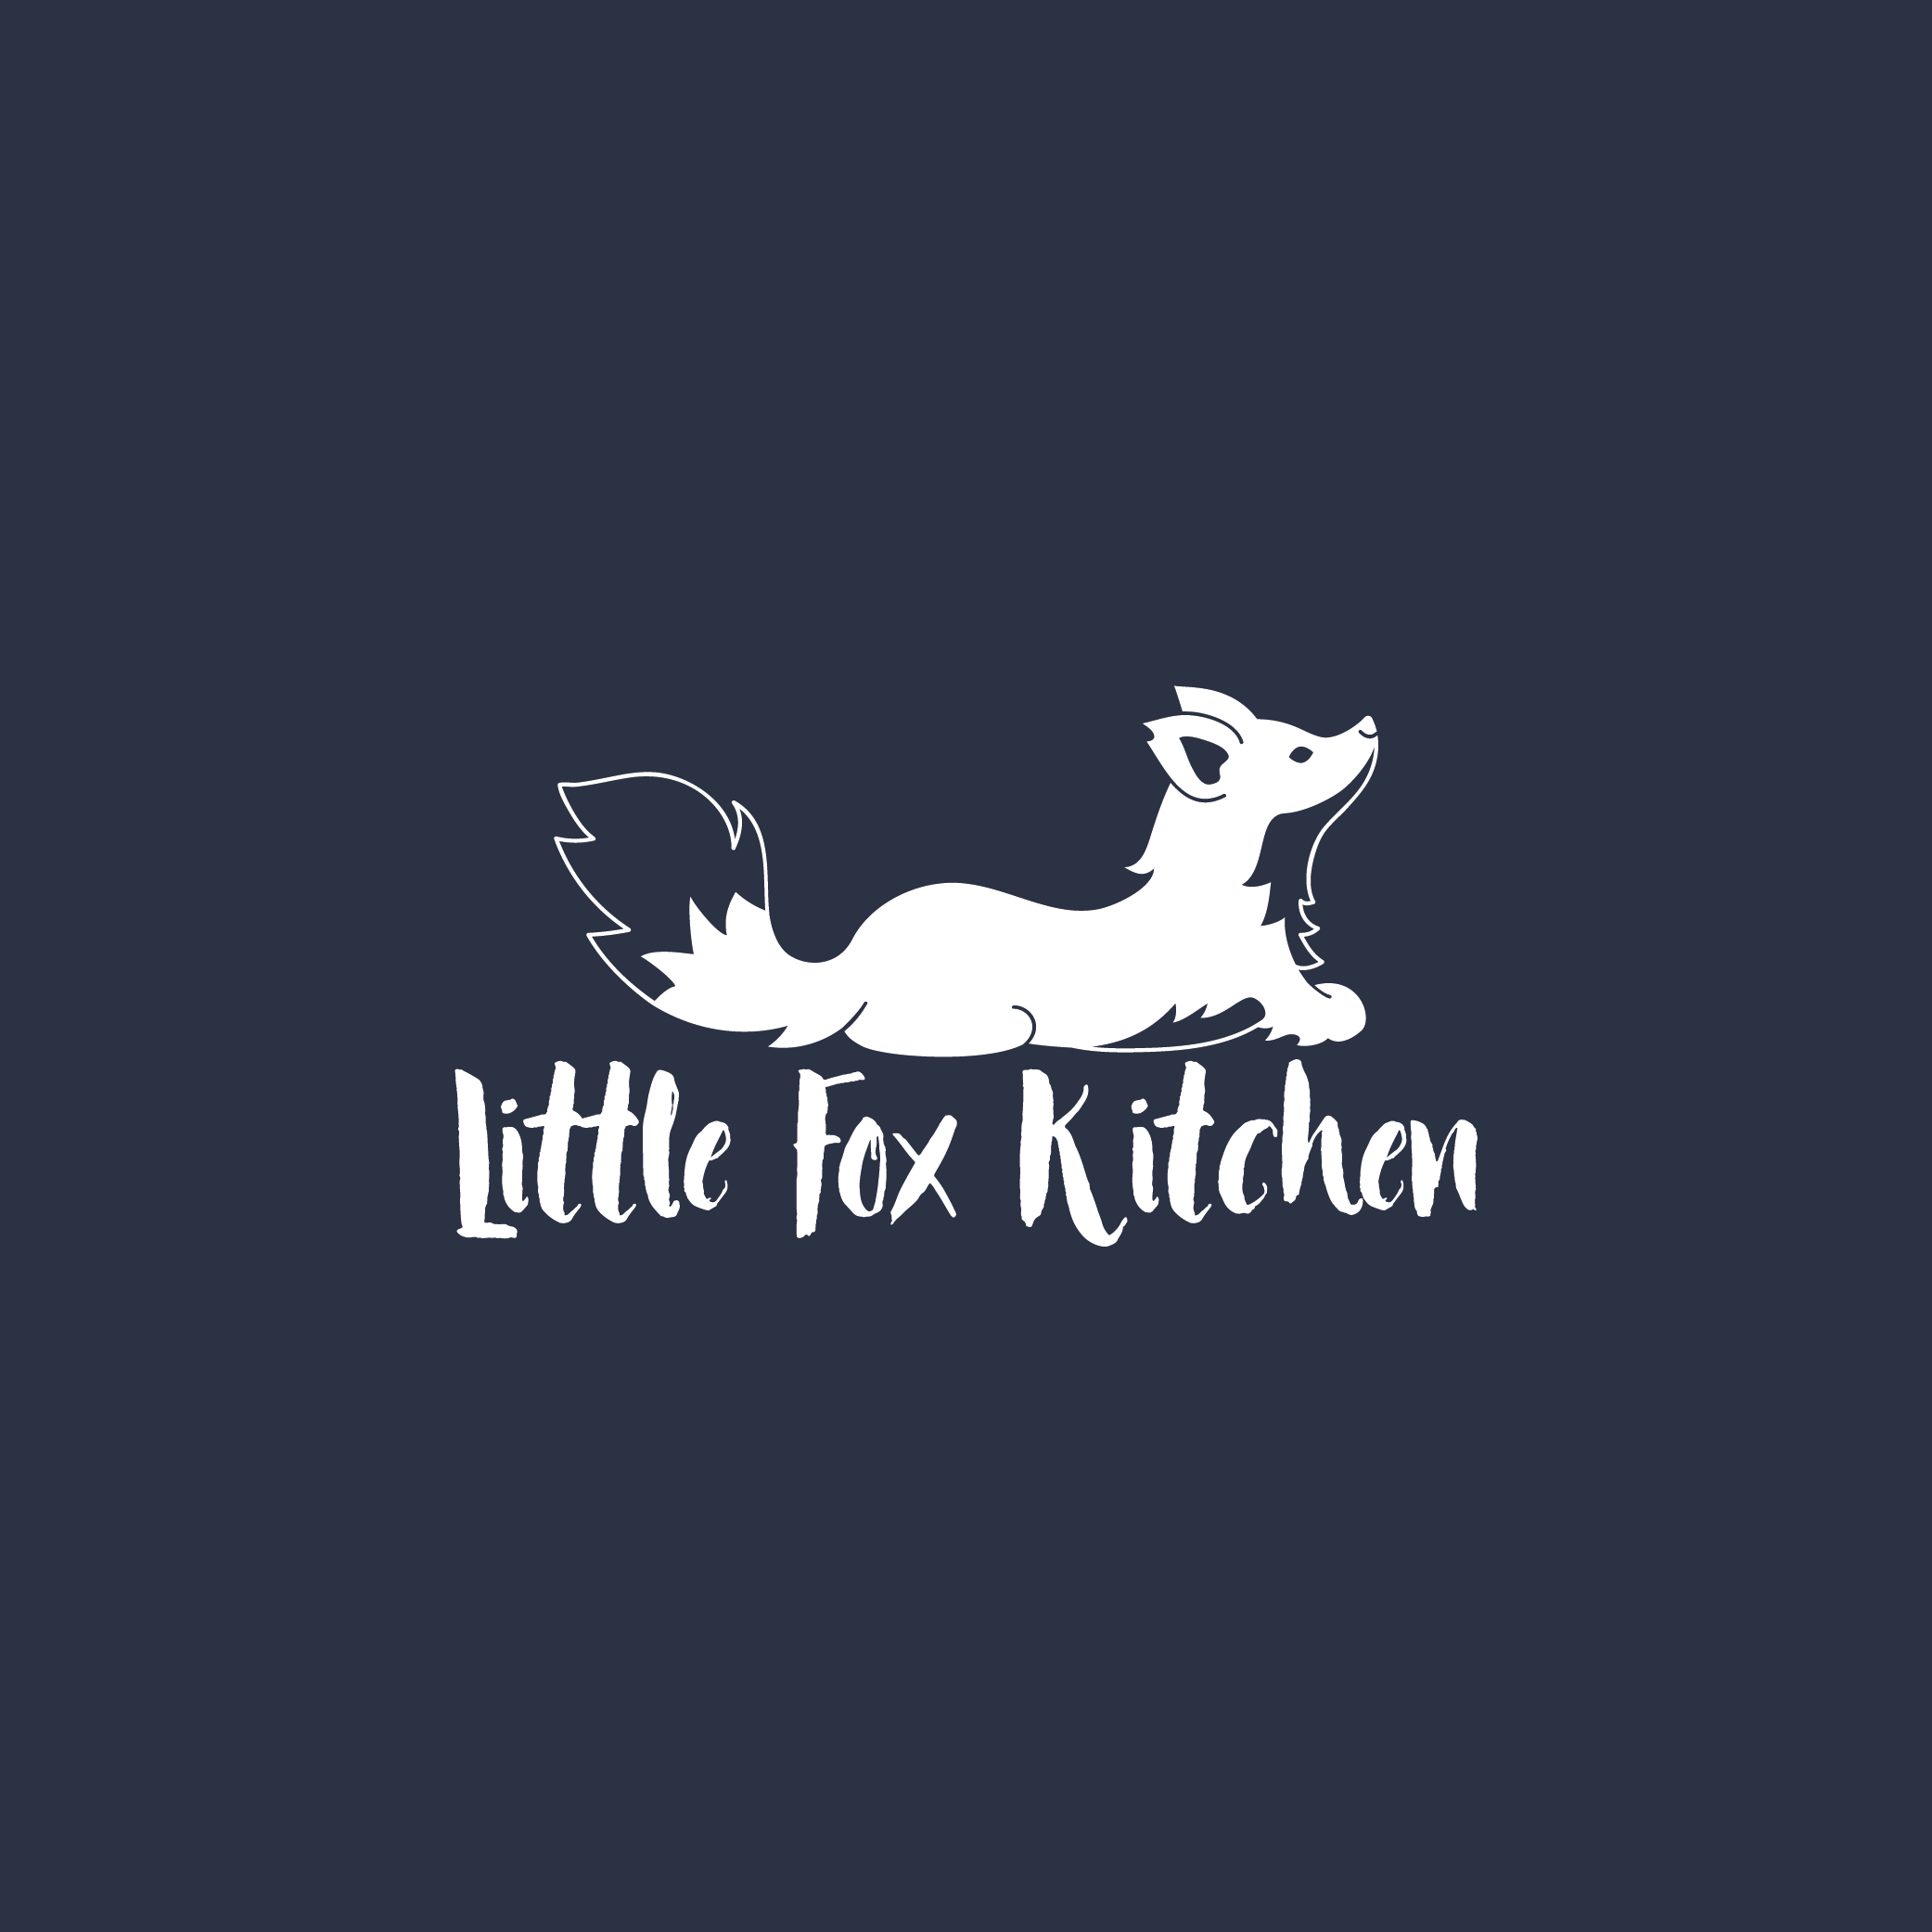 Little Fox Kitchen_logo_design_all_Artboard 27 copy 4.png